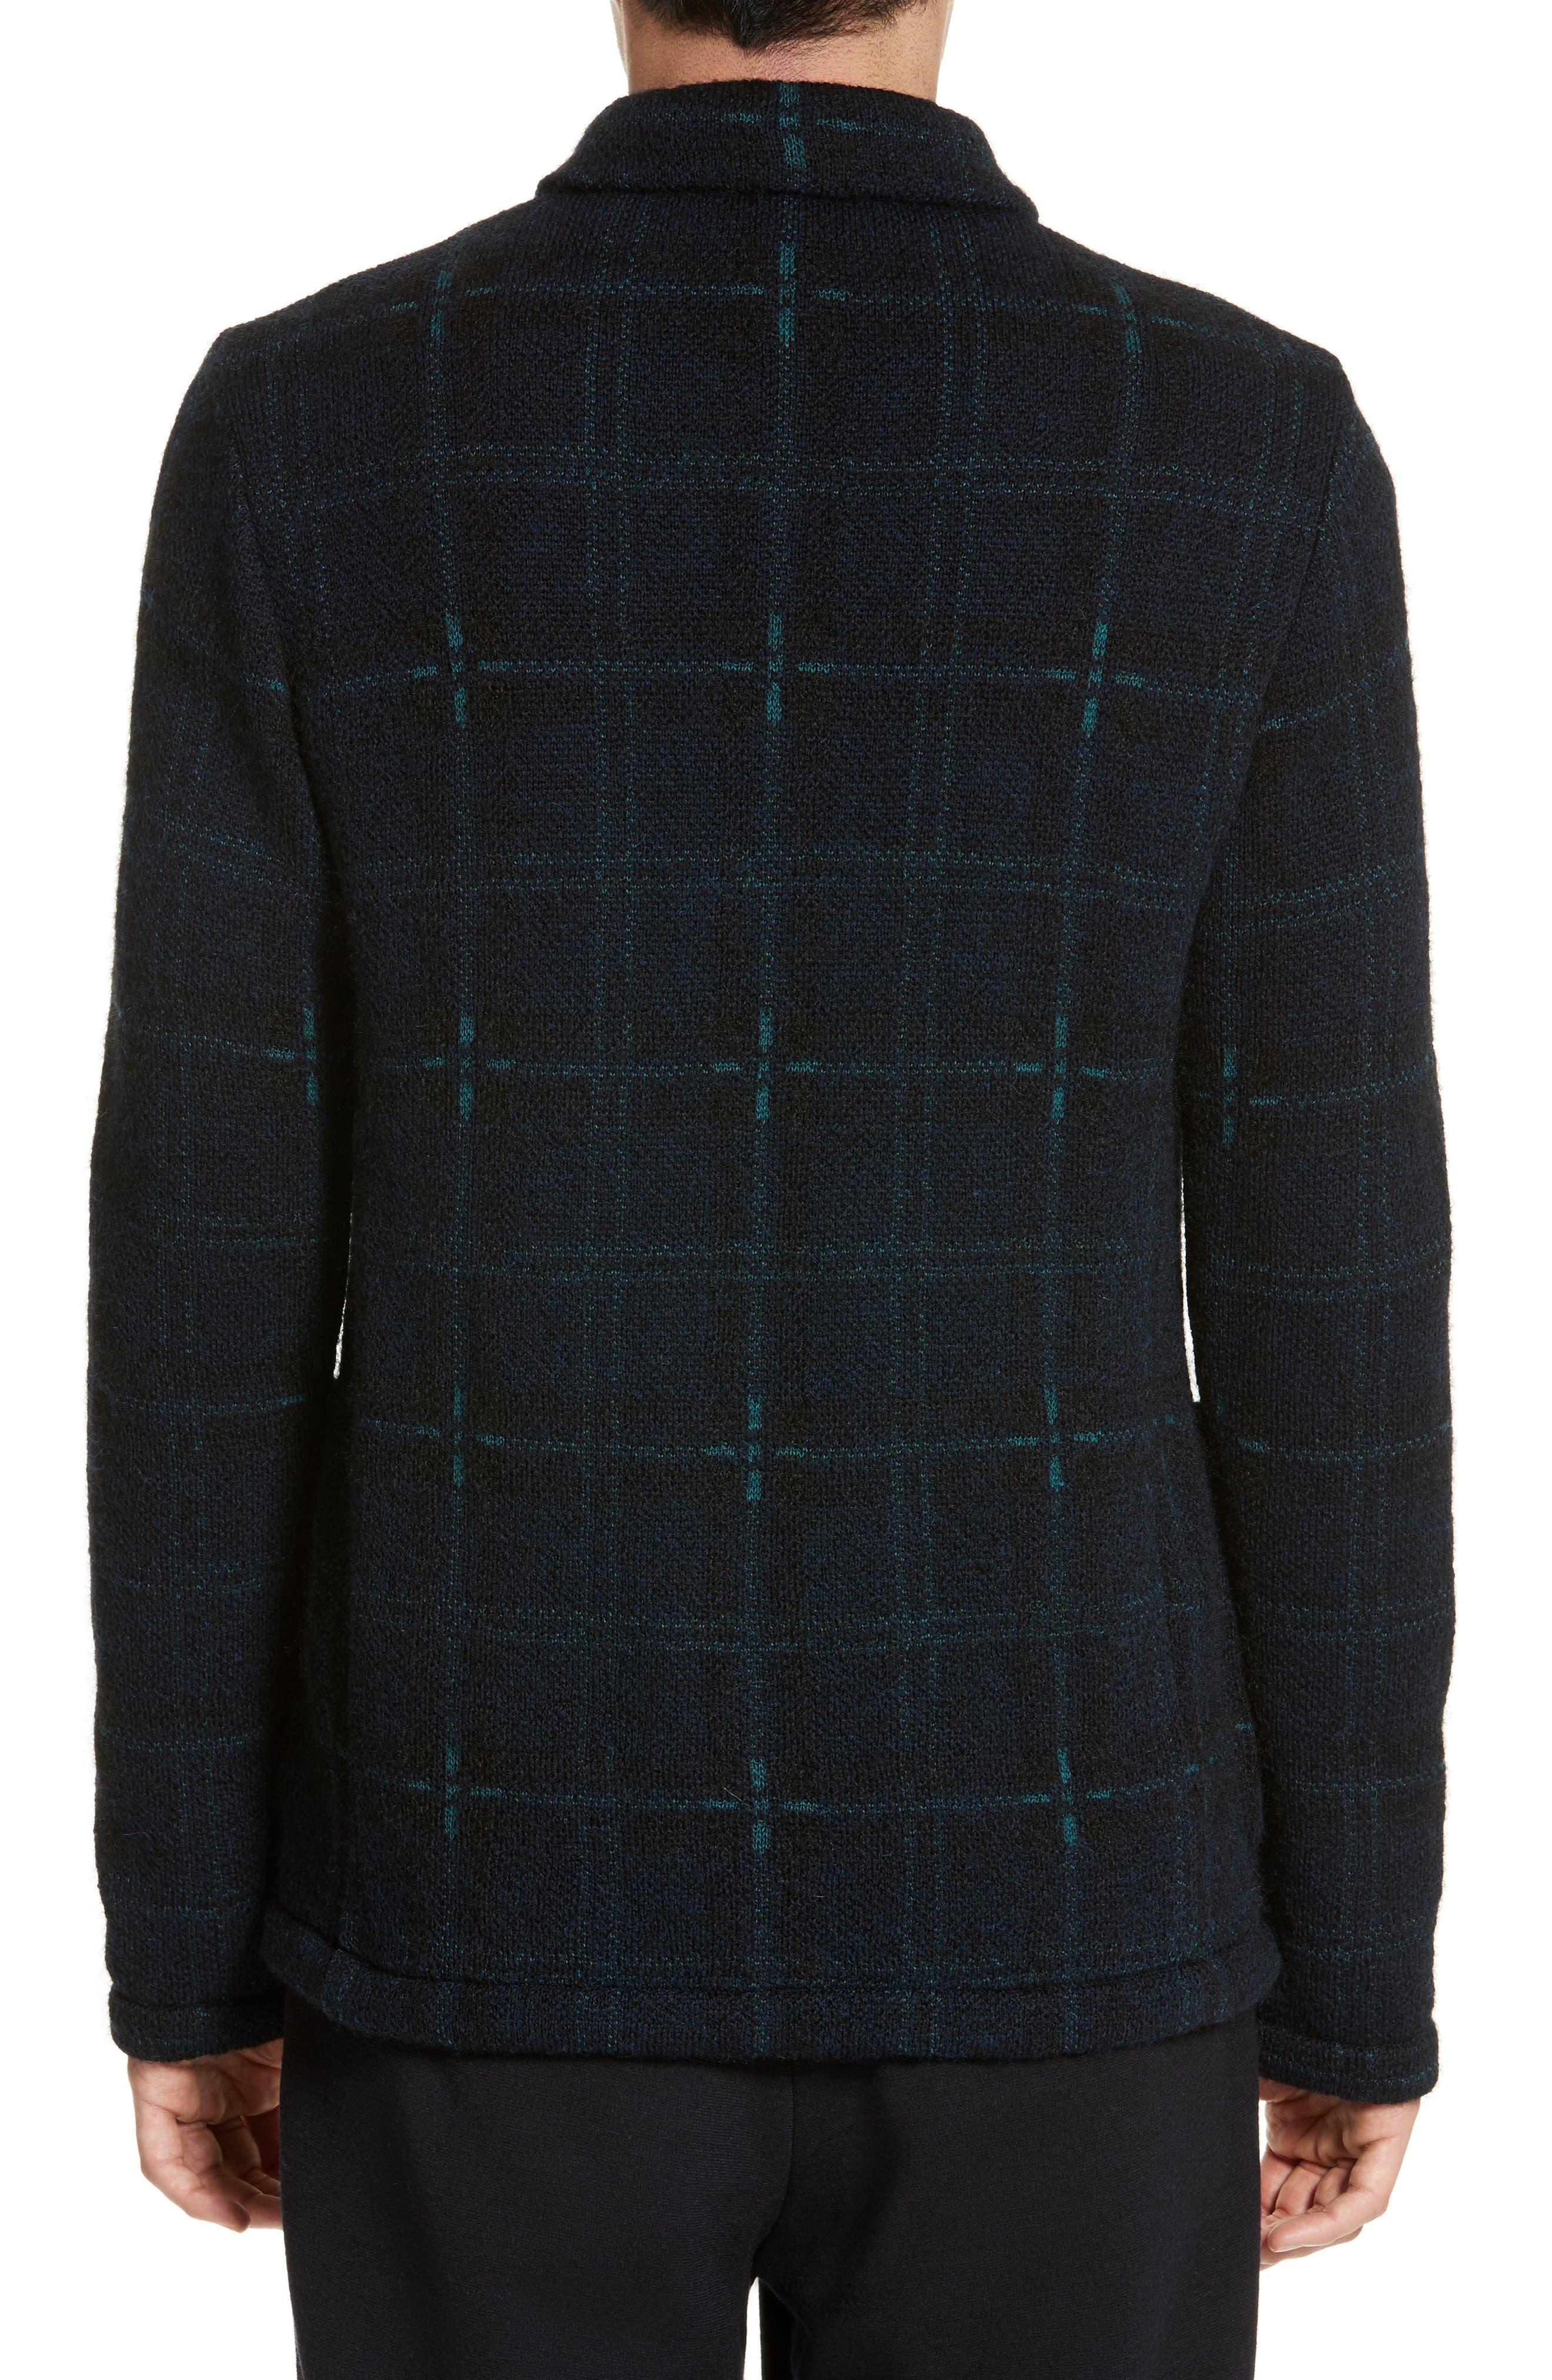 Alternate Image 2  - Tomorrowland Wool Blend Knit Sportcoat